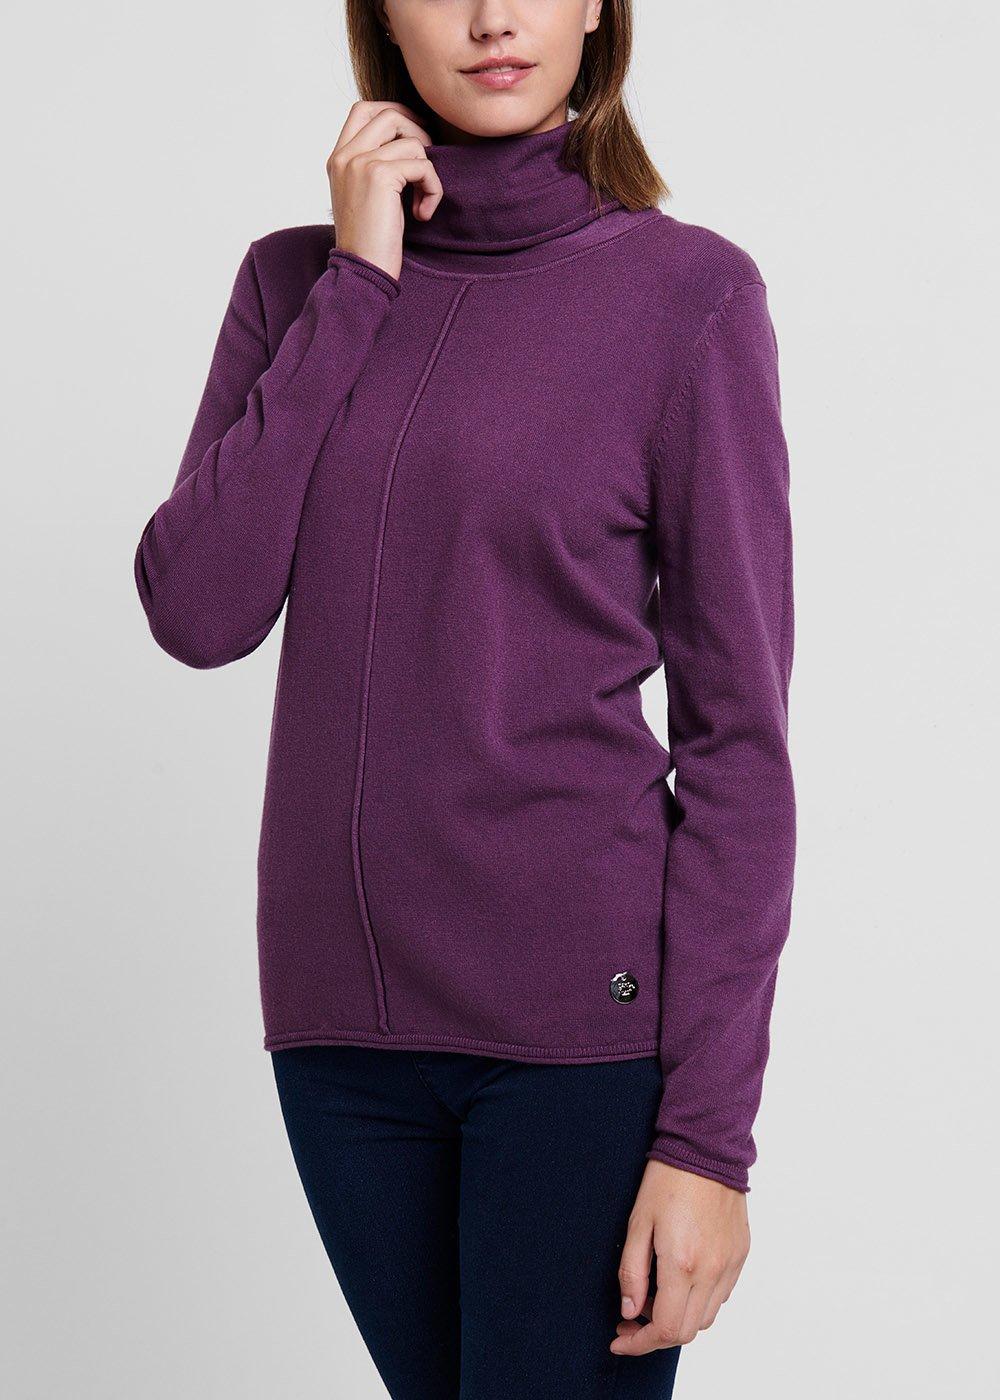 Malika turtleneck sweater in viscose - Astrale - Woman